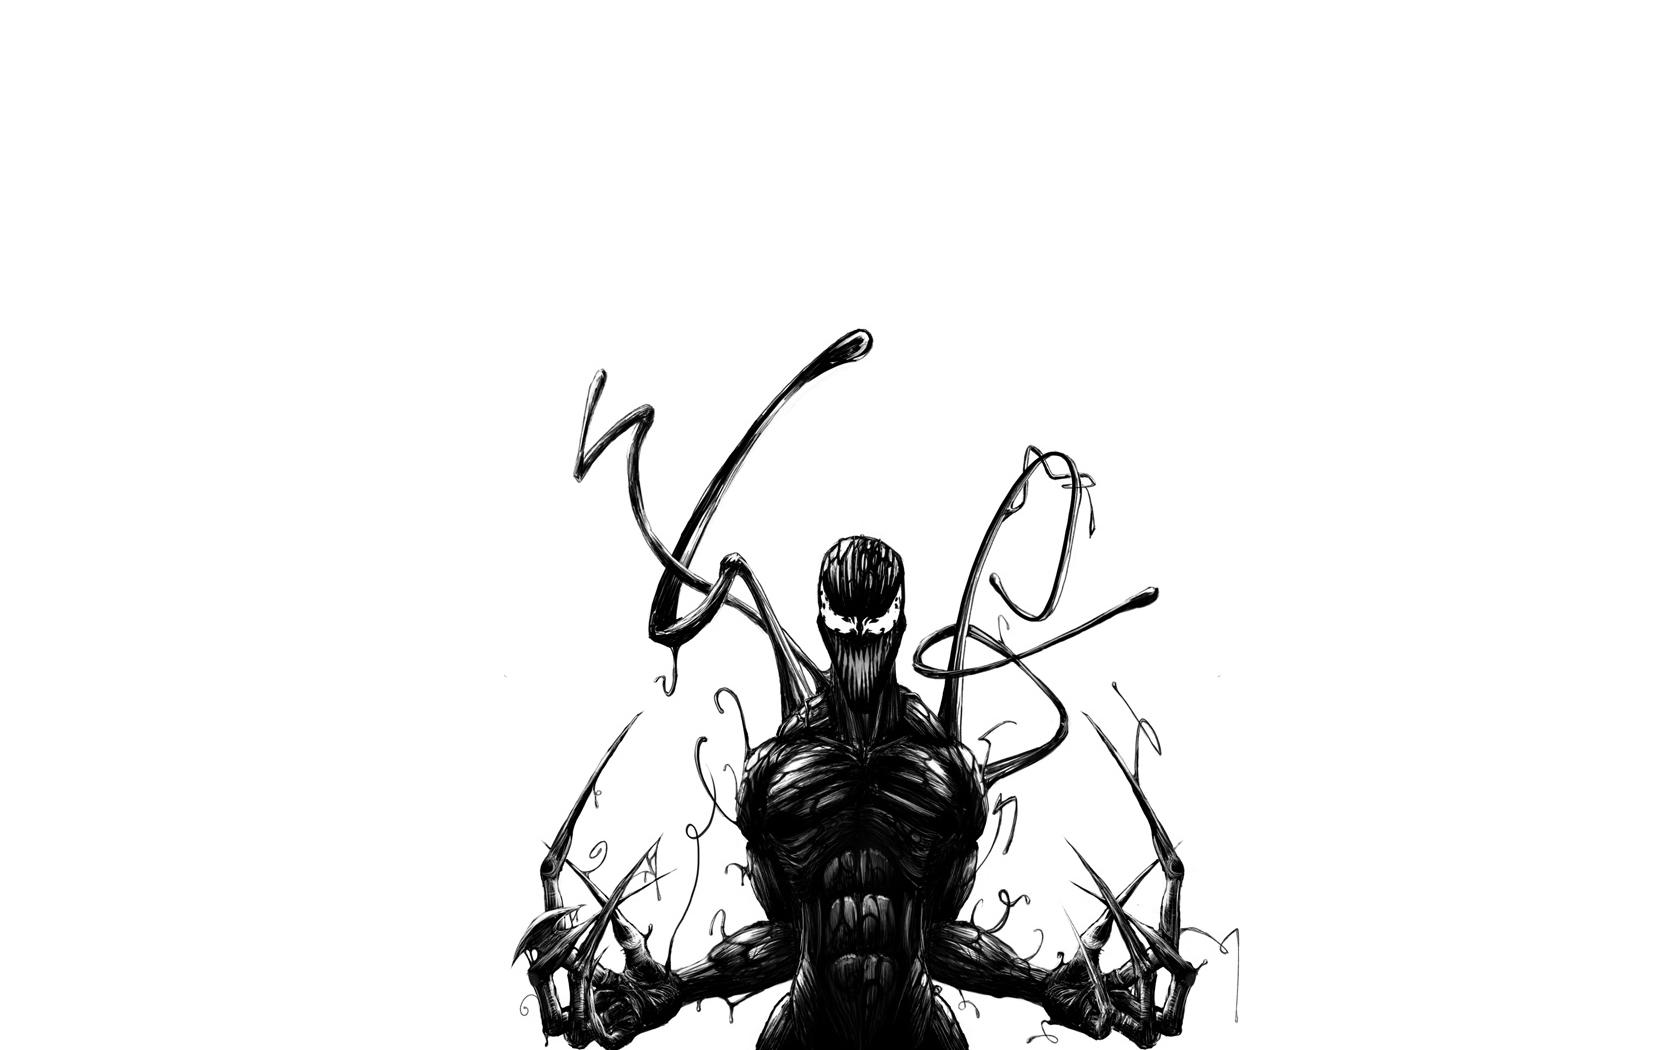 Venom Wallpaper 1680x1050